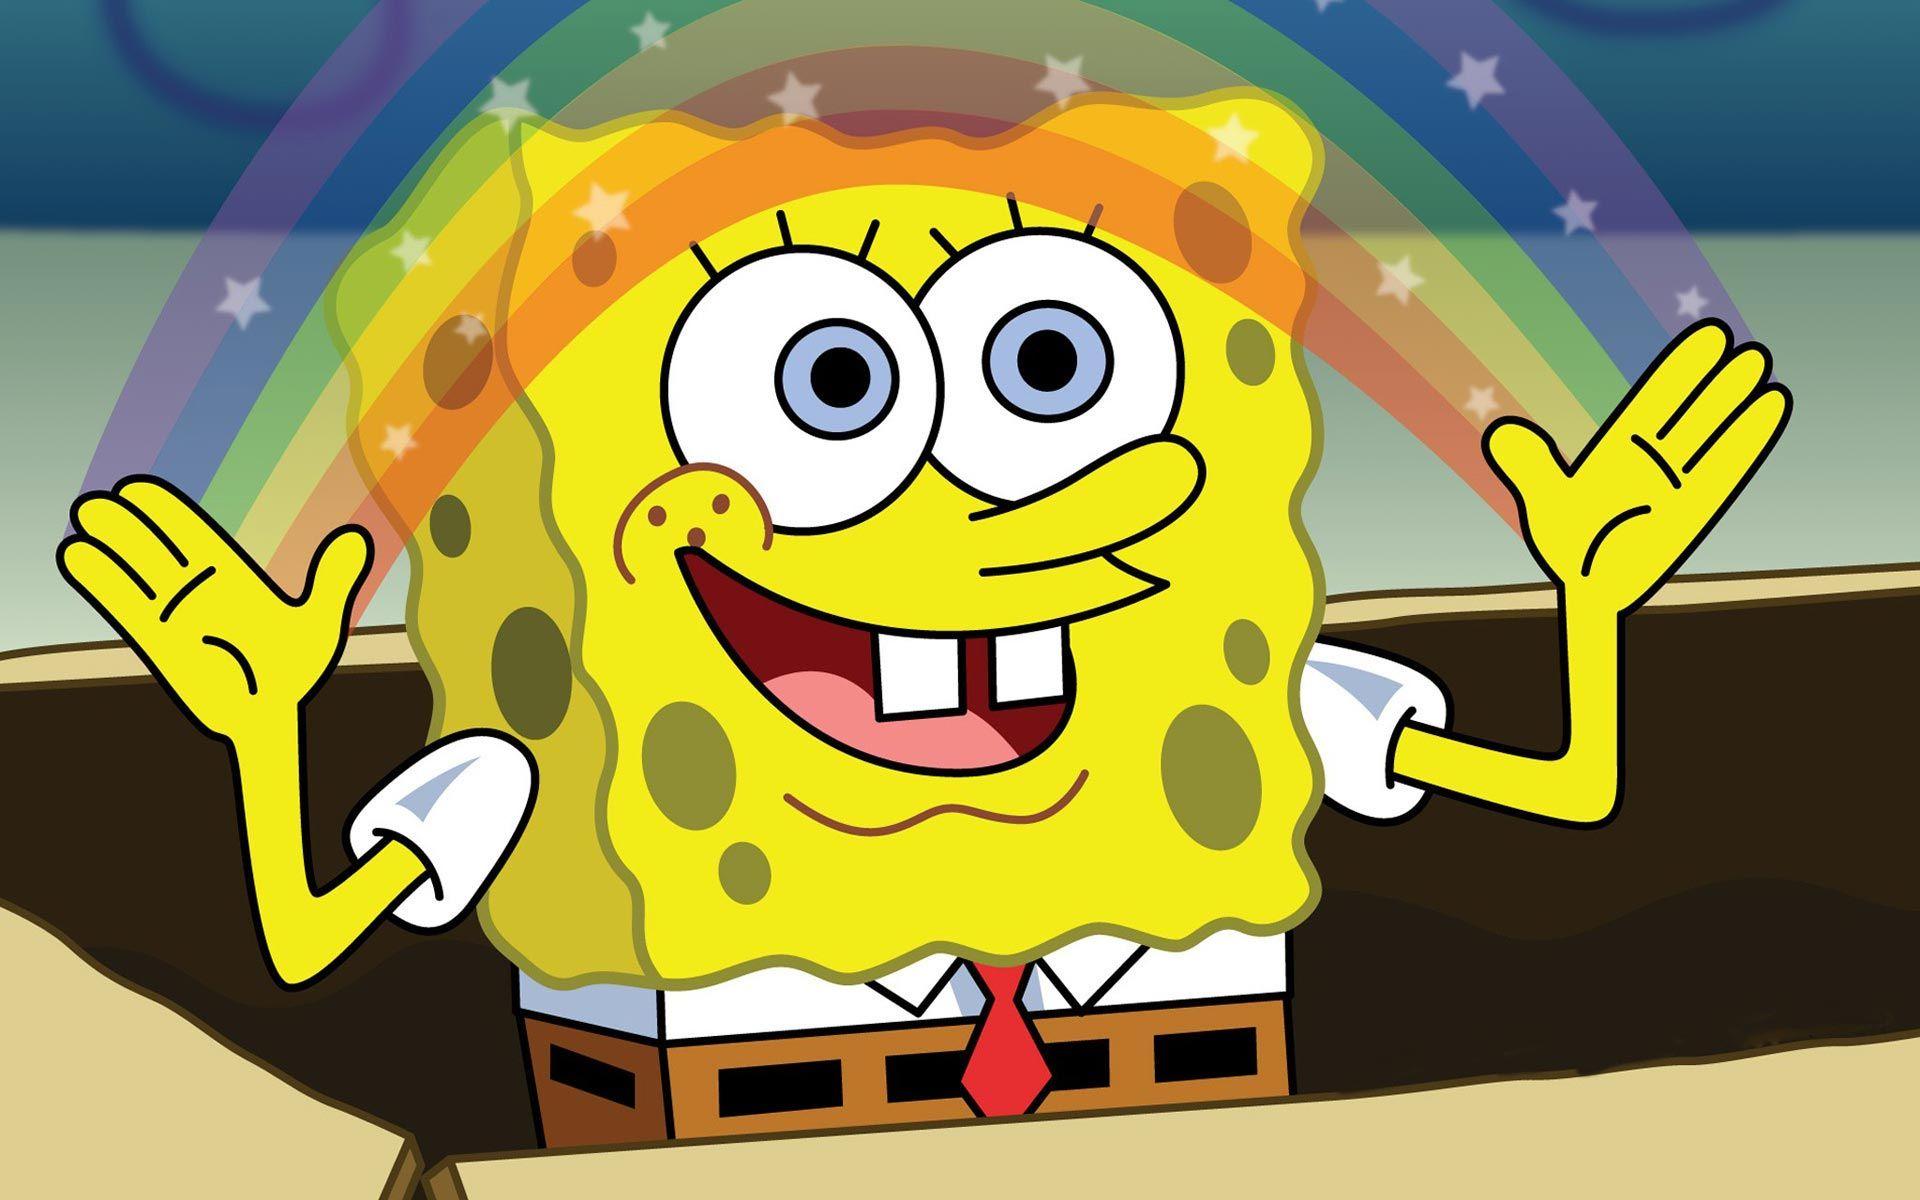 Spongebob Rainbow Meme Wallpaper